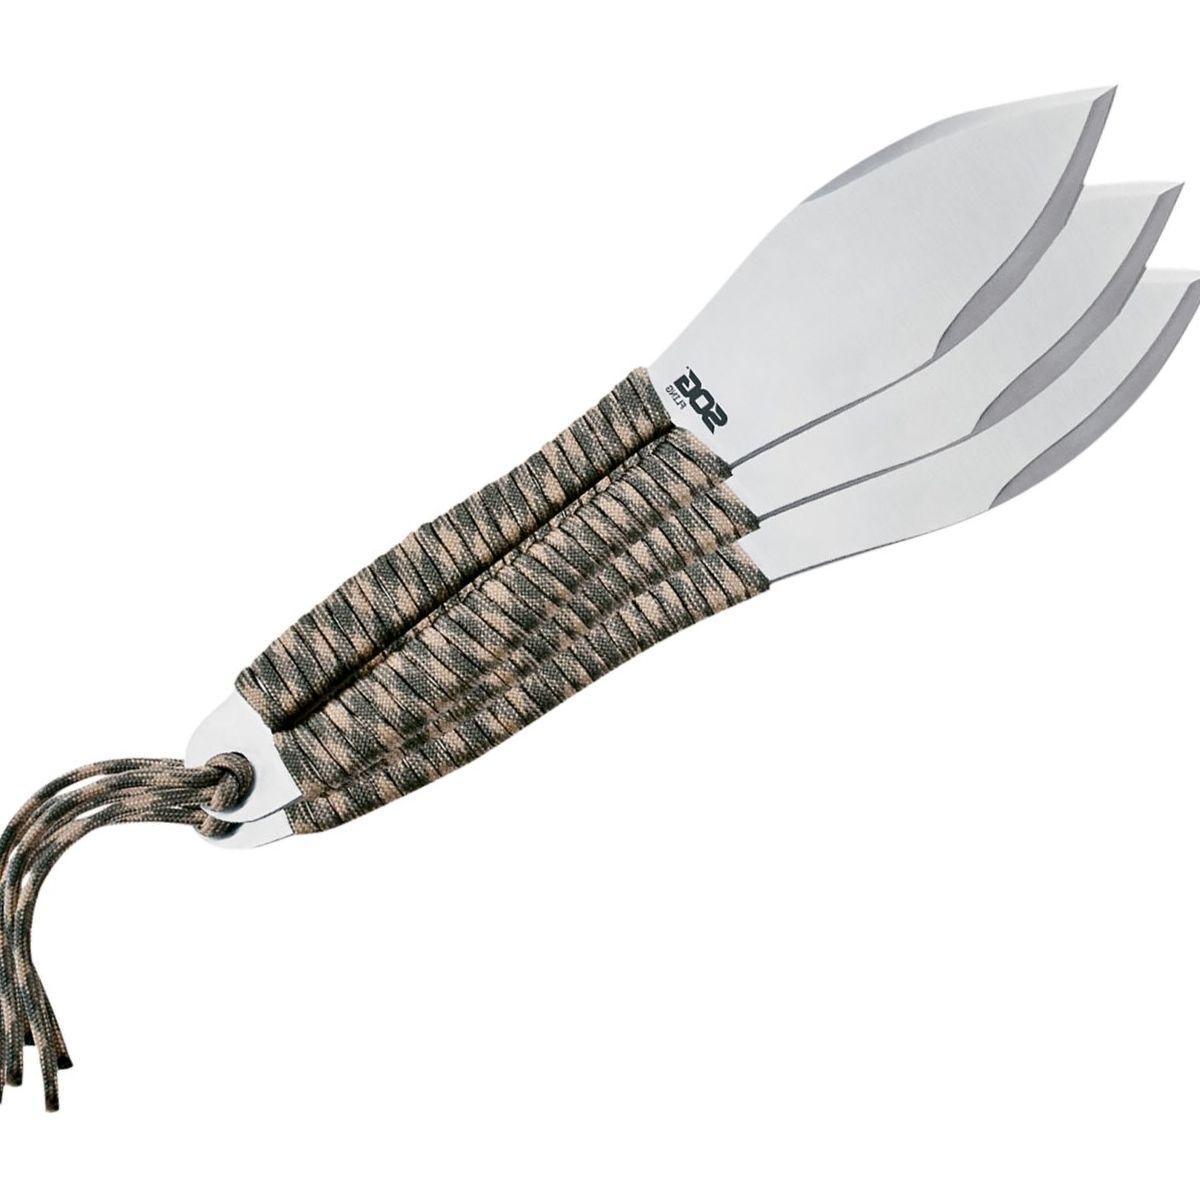 SOG® Fling Throwing-Knife Set